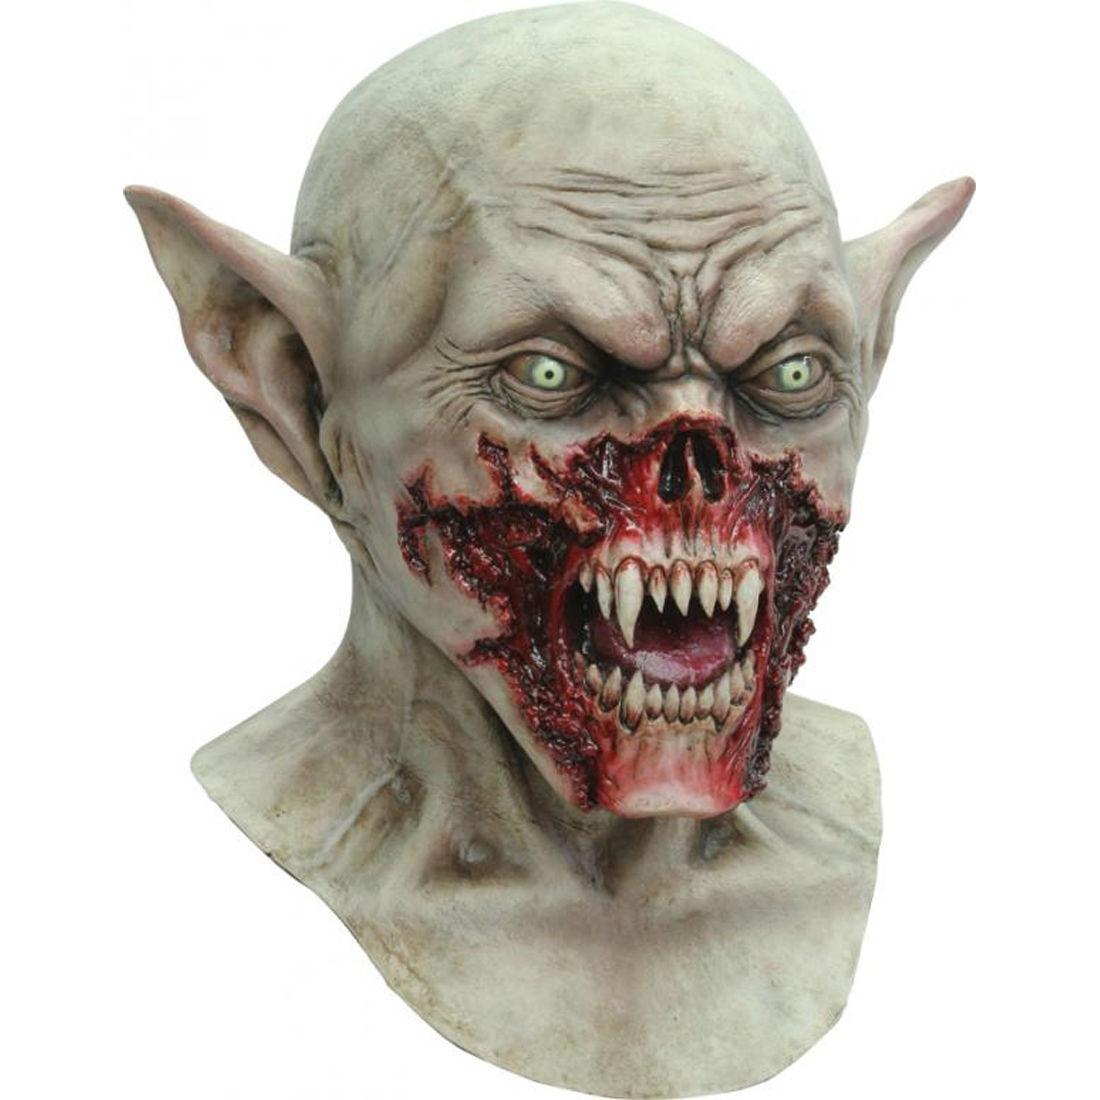 Top 10 scariest masks ever ebay - Masque halloween horreur ...